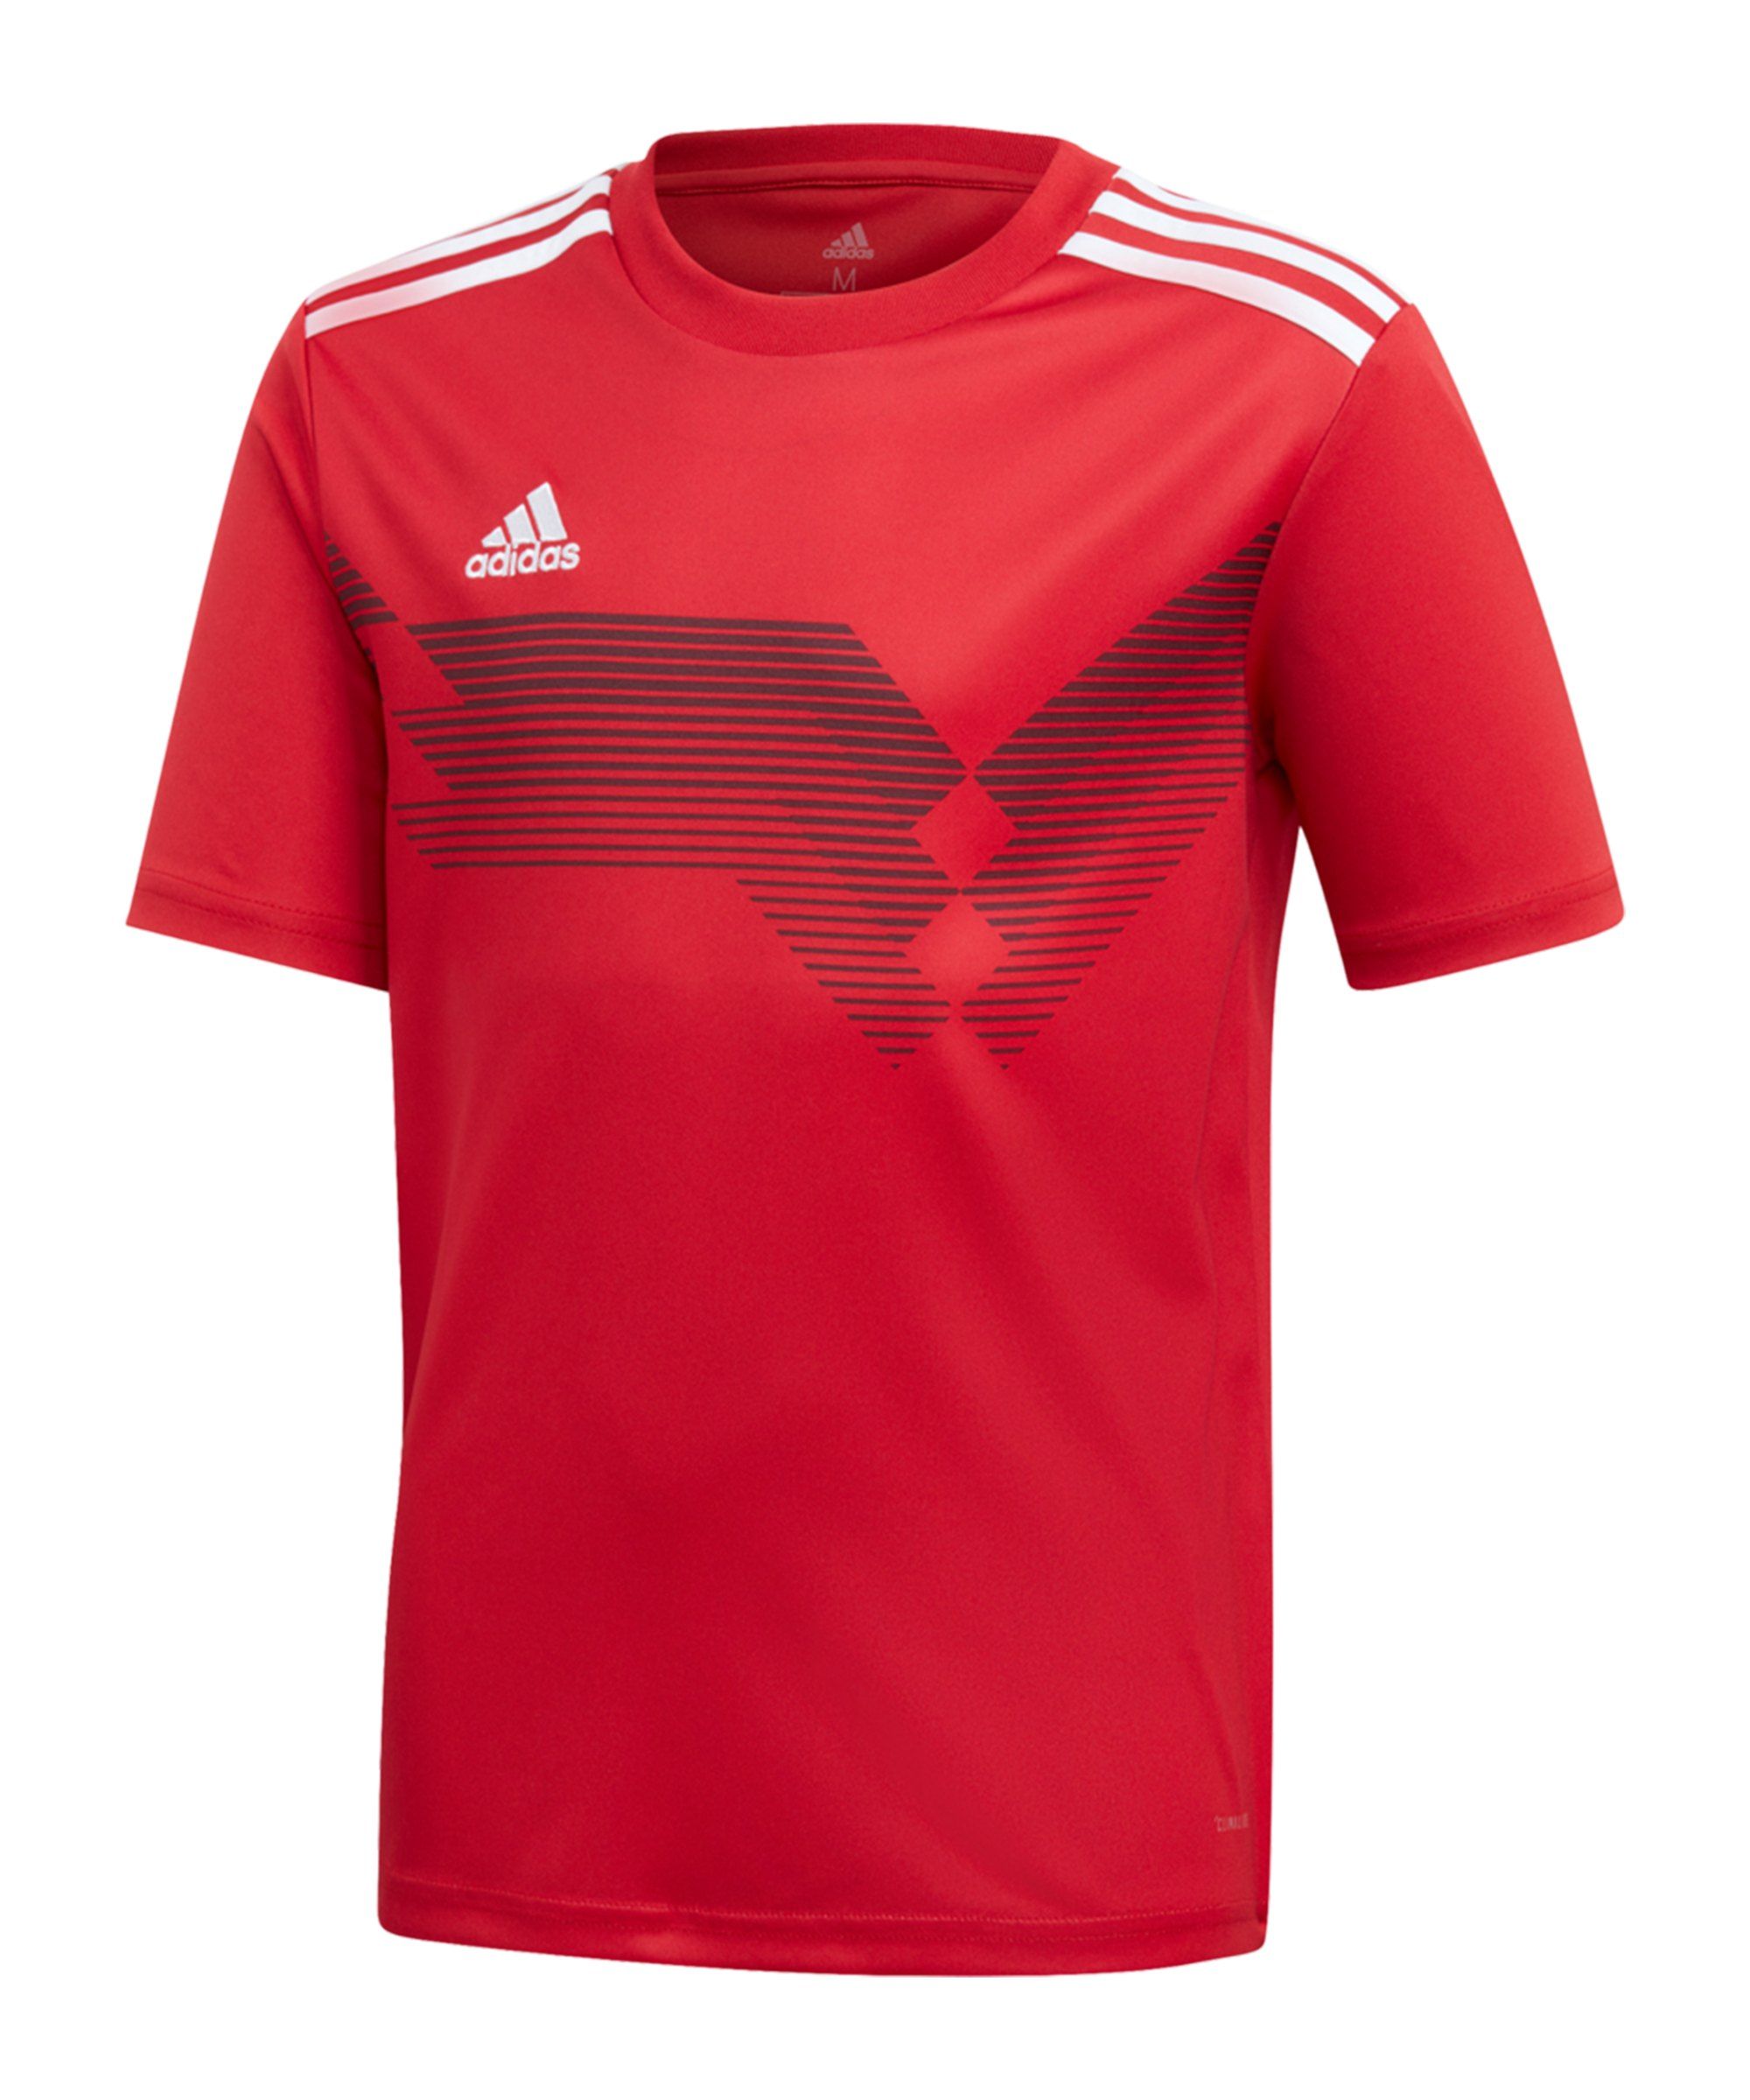 adidas Campeon 19 Trikot kurzarm Kids Rot Weiss - rot